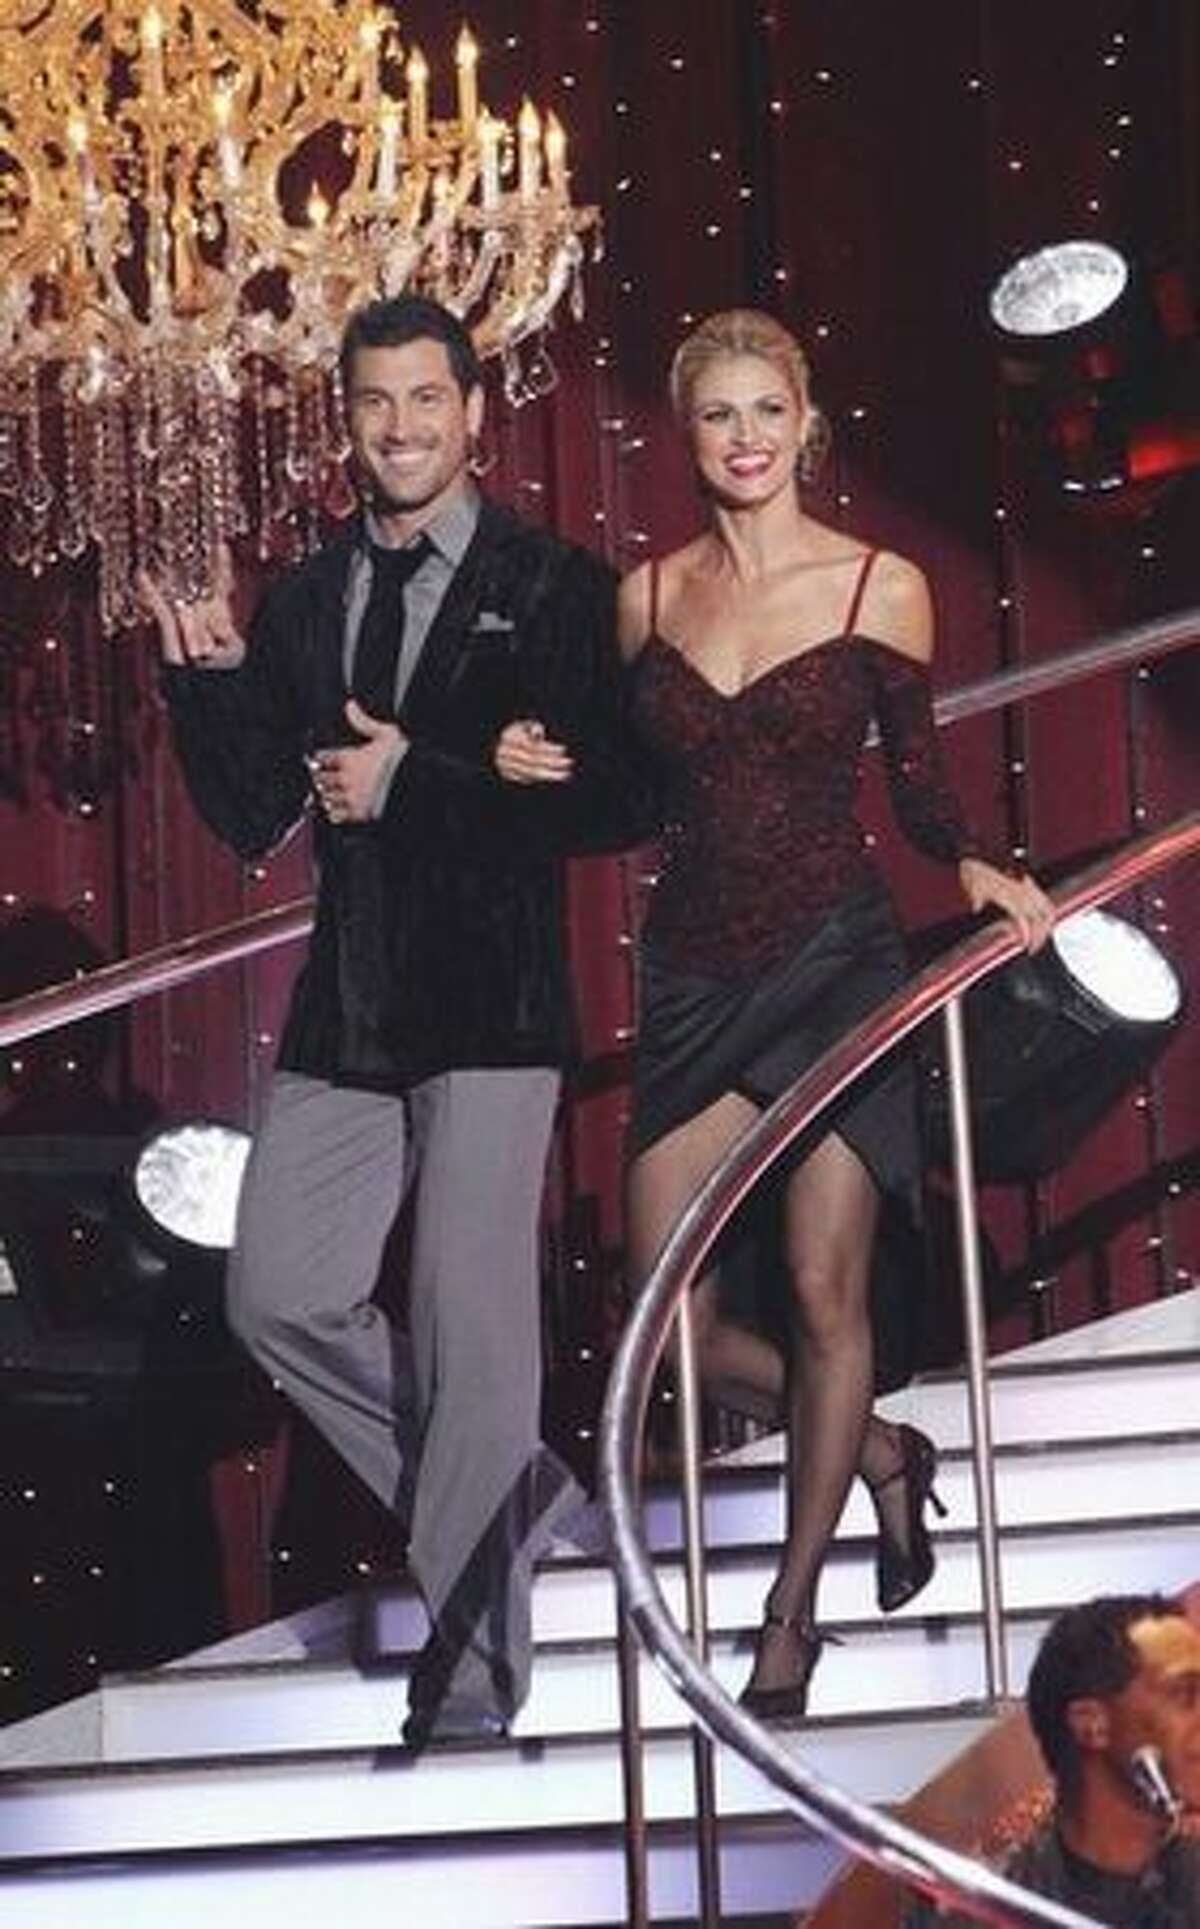 Sportscaster Erin Andrews and her partner, Maksim Chmerkovskiy;